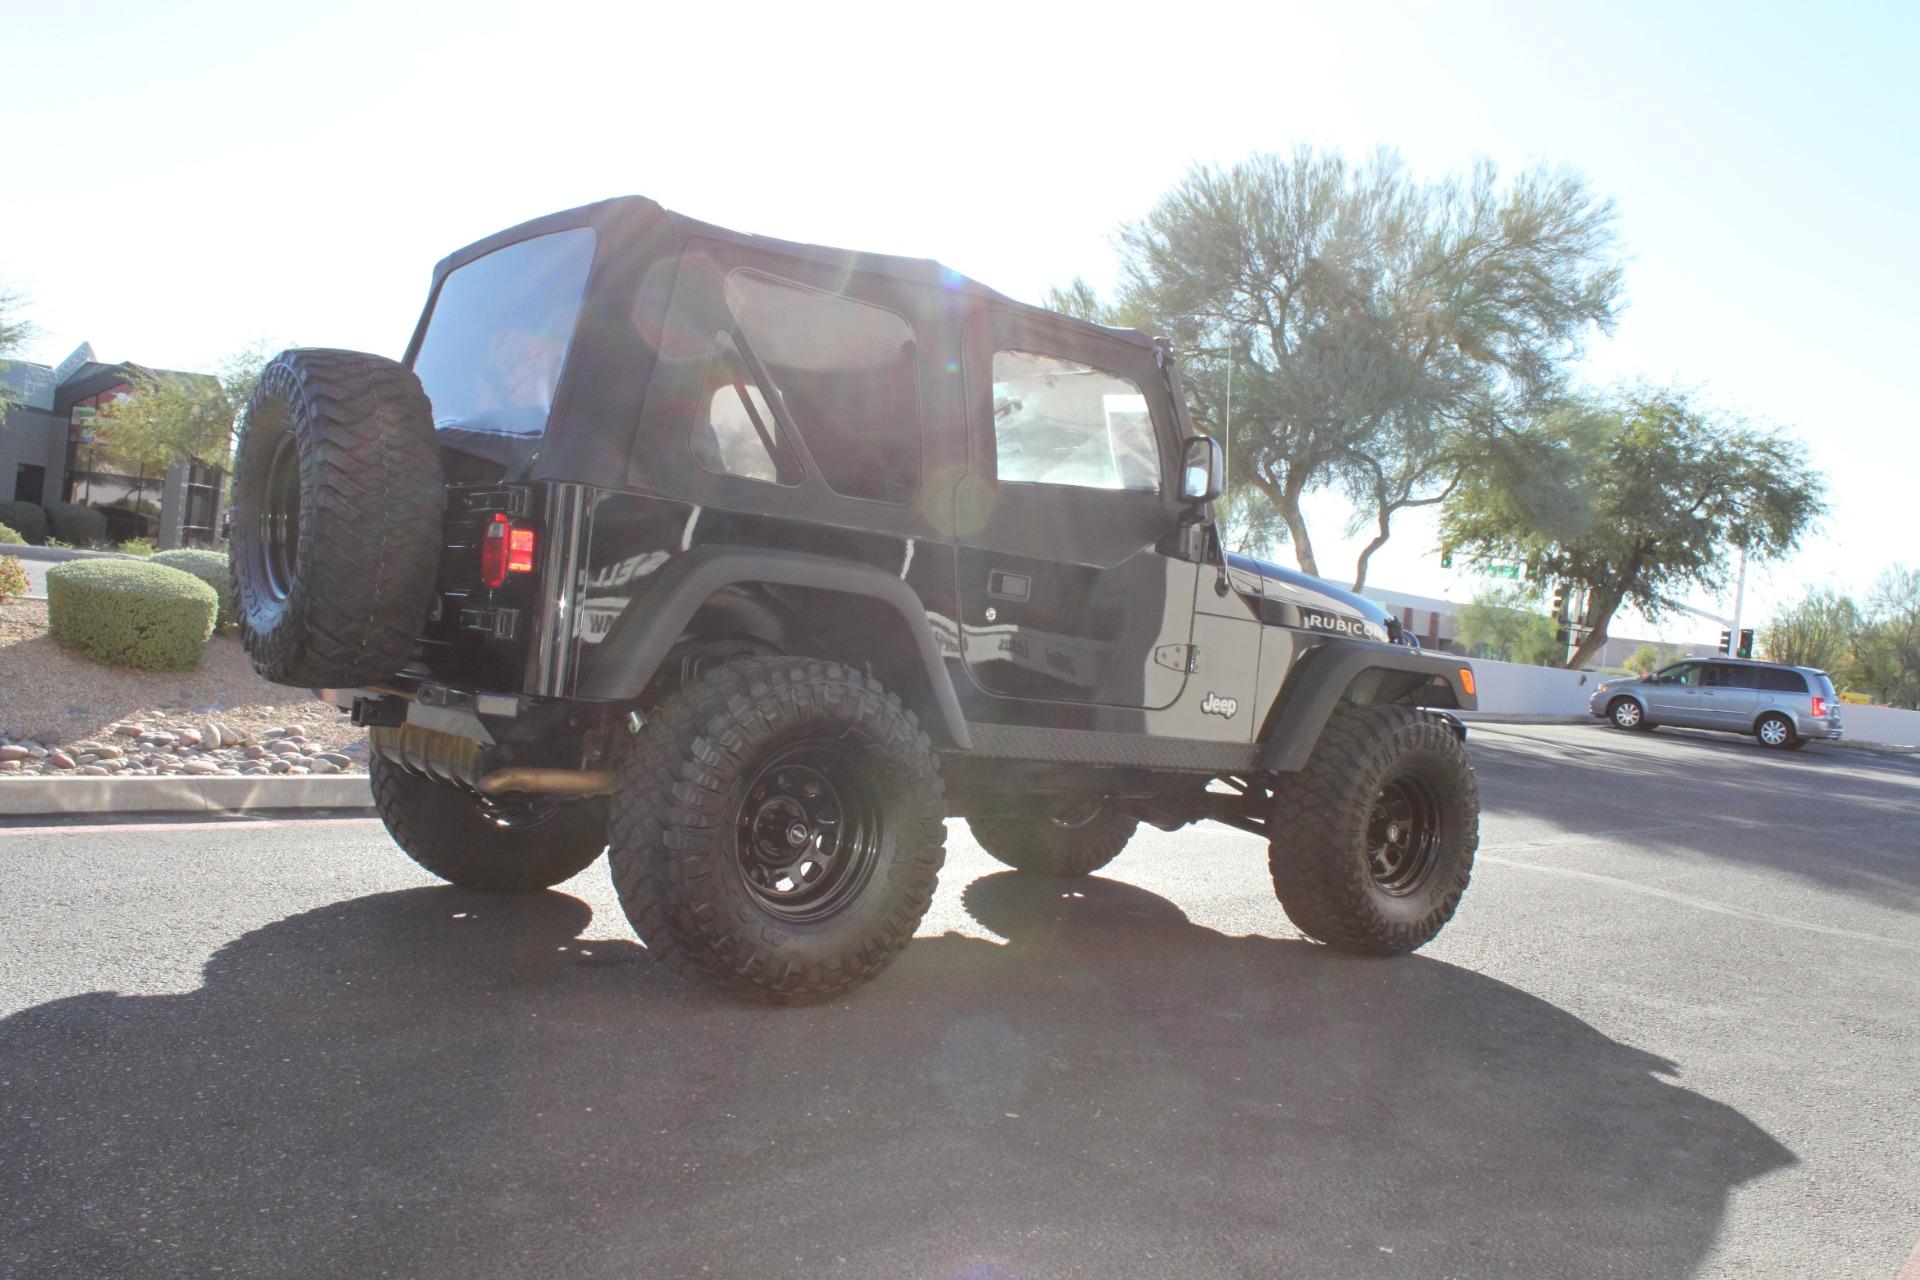 Used-2004-Jeep-Wrangler-Rubicon-Fiat